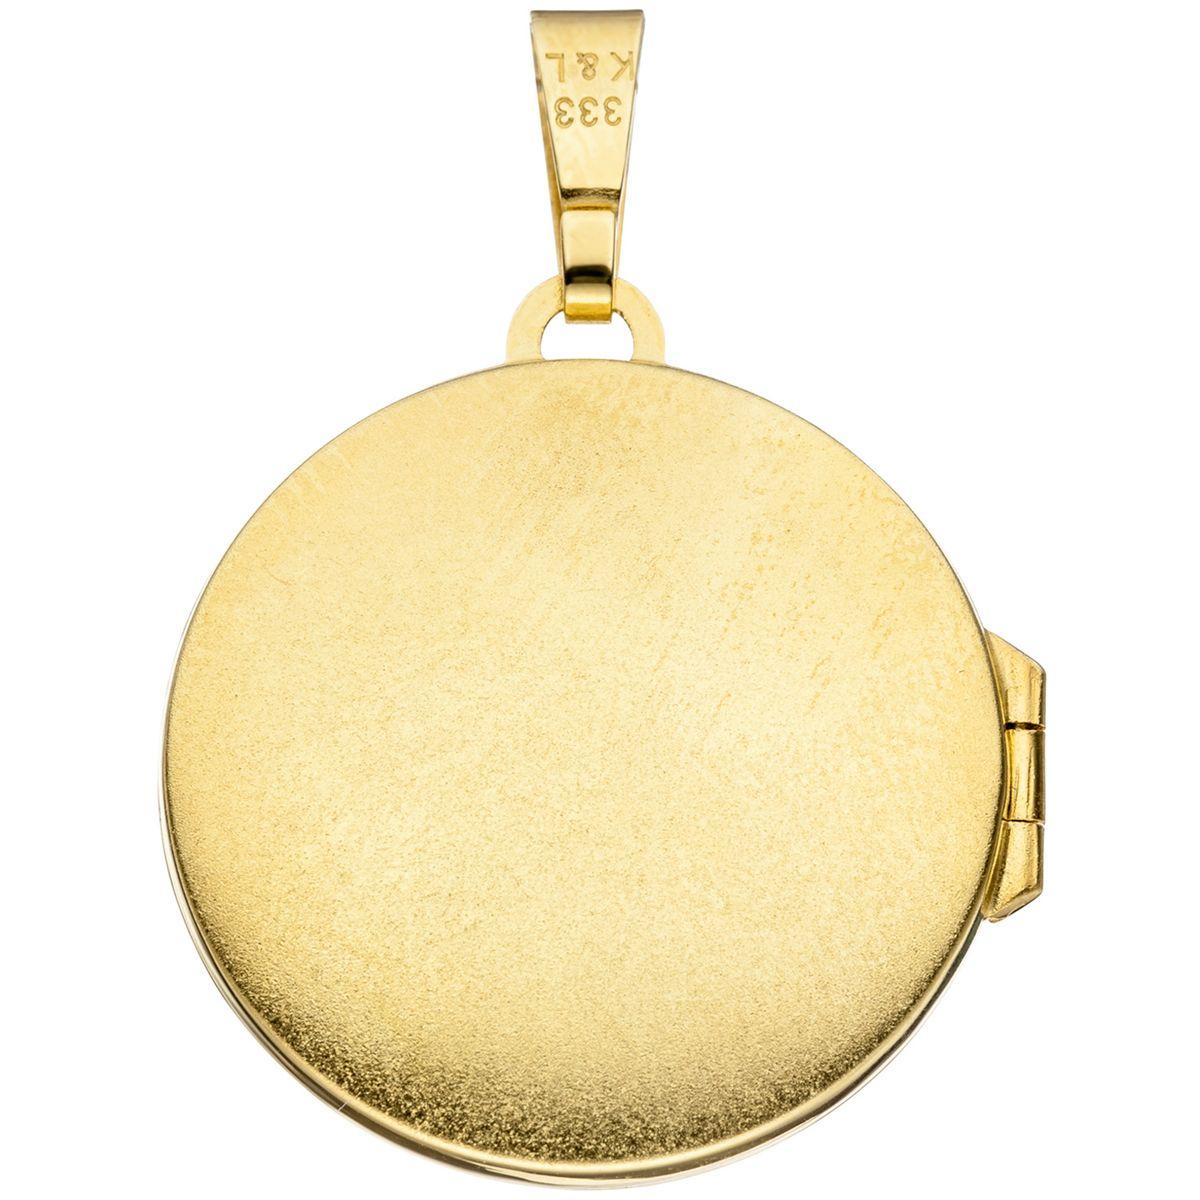 medaillon rund anh nger 333 gold gelbgold teilrhodiniert. Black Bedroom Furniture Sets. Home Design Ideas